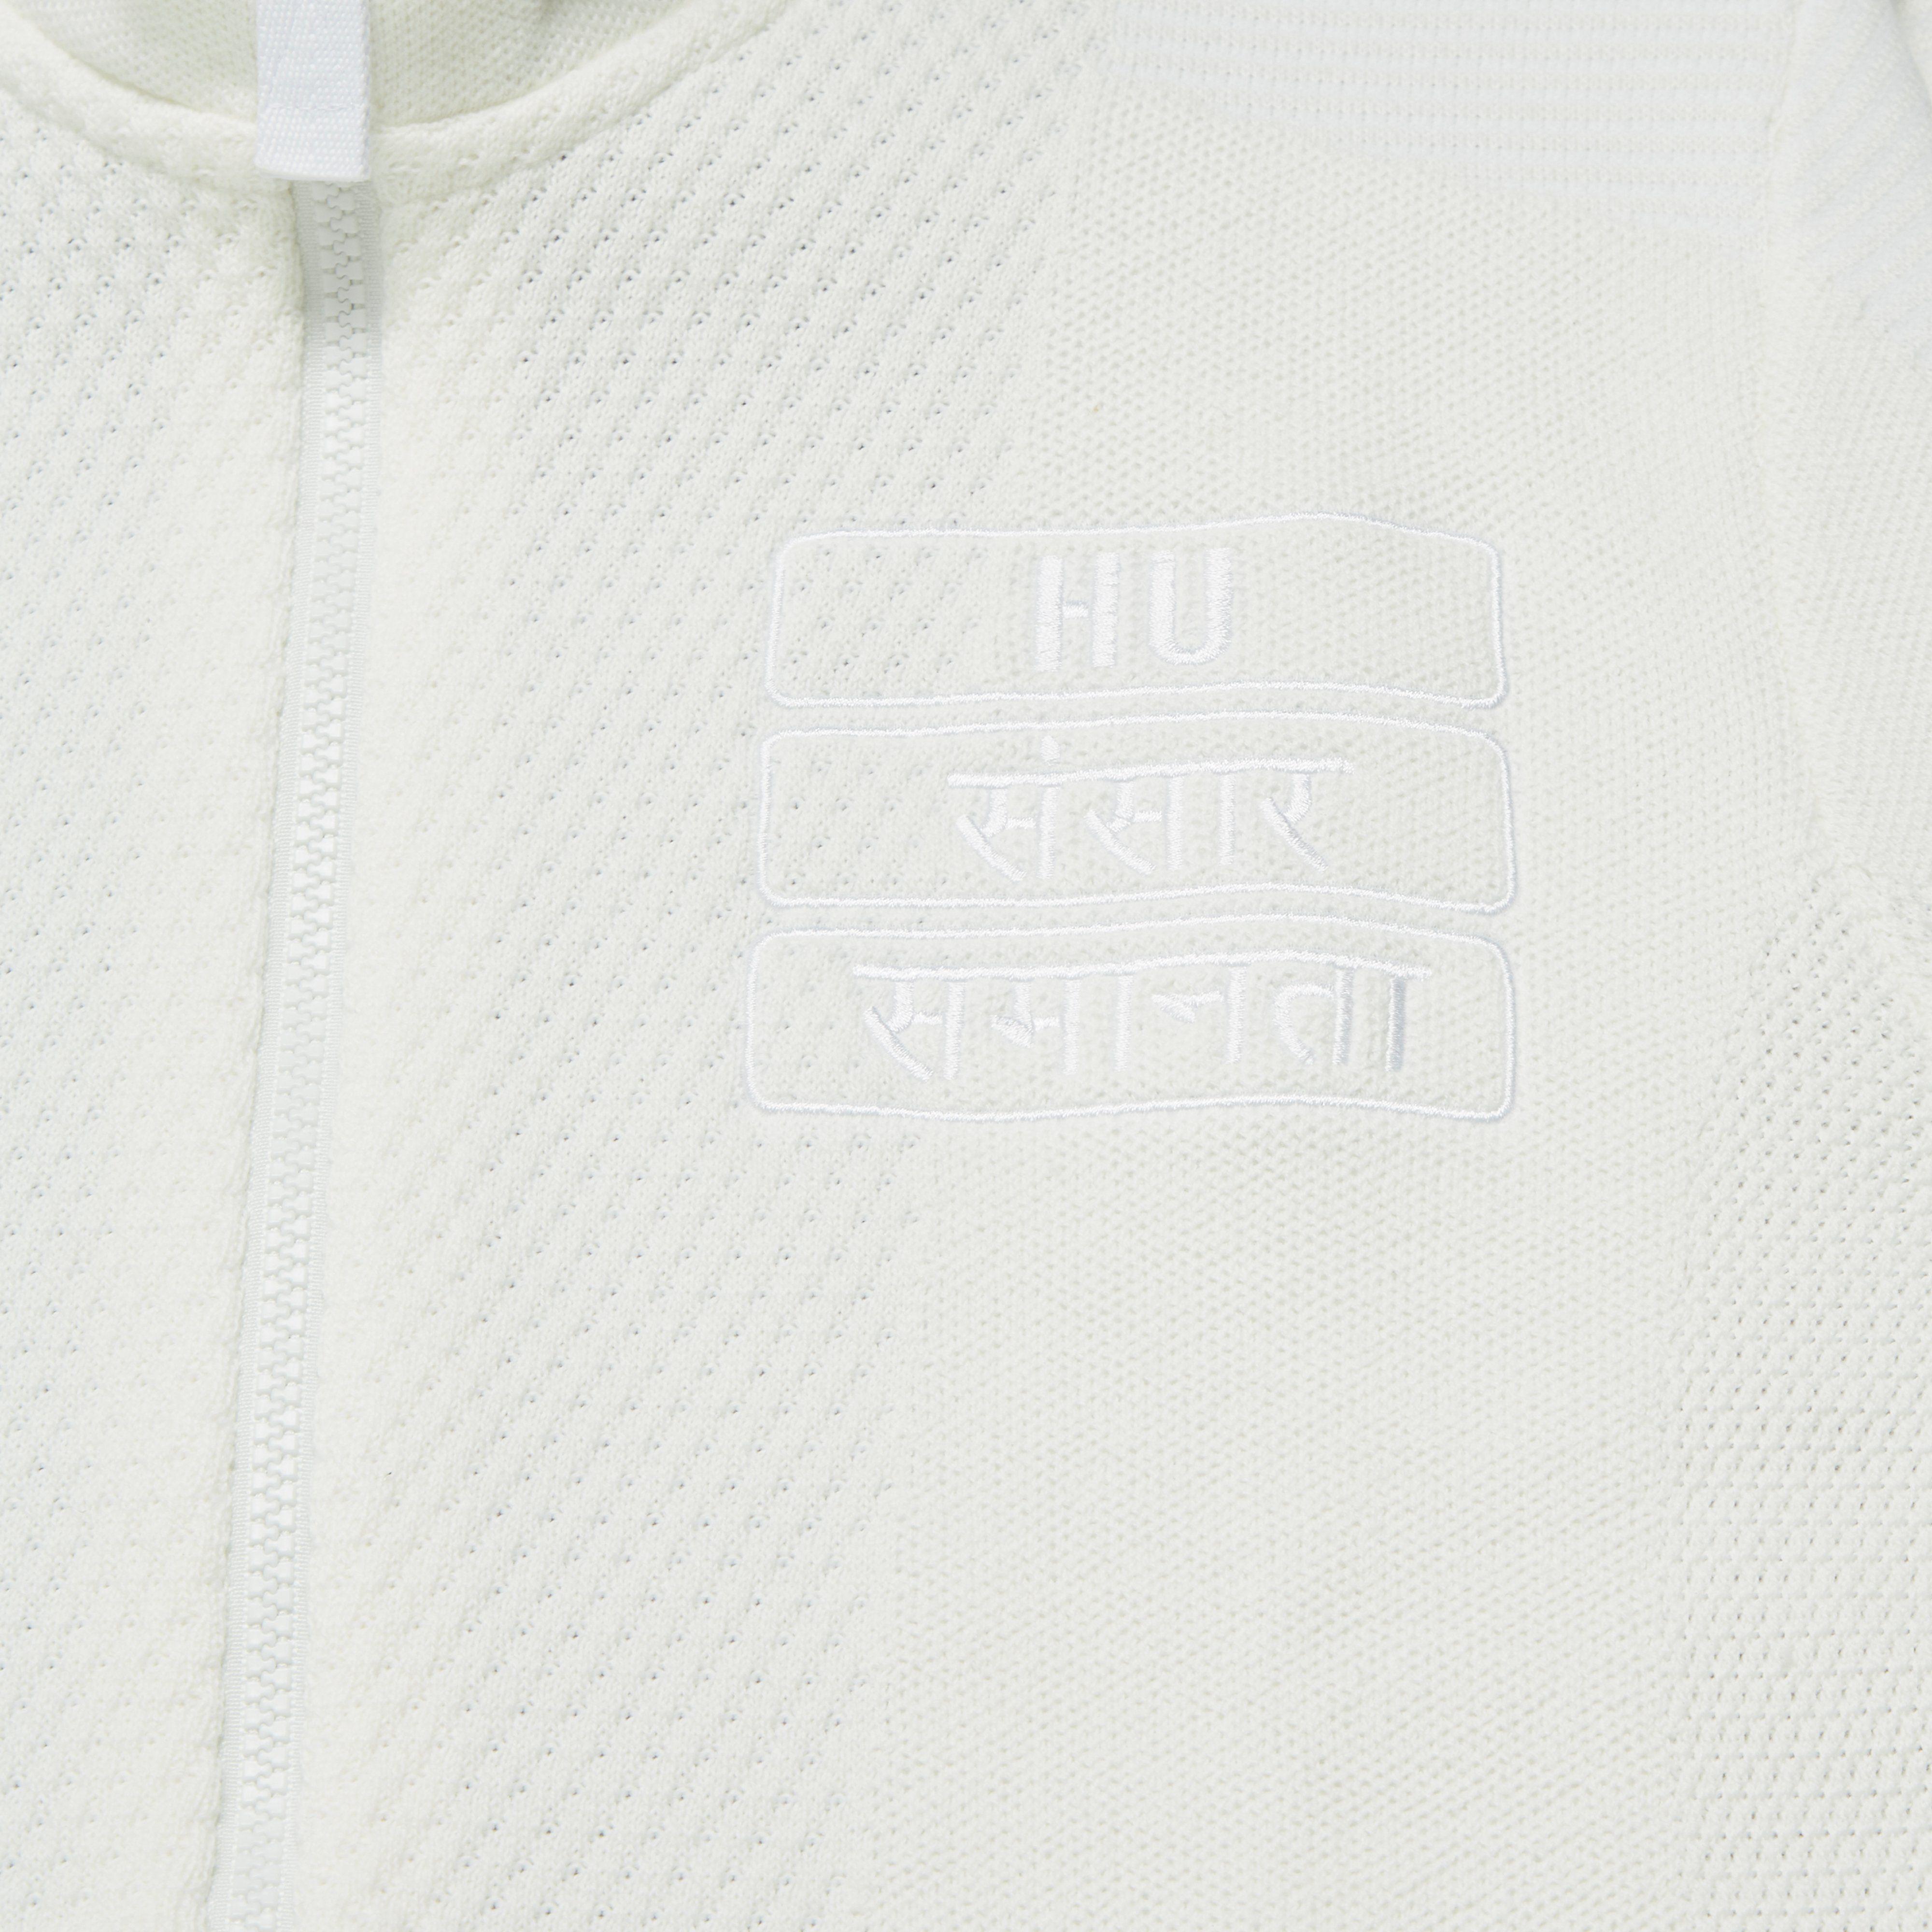 adidas Originals x Pharrell HU Knit Track Top